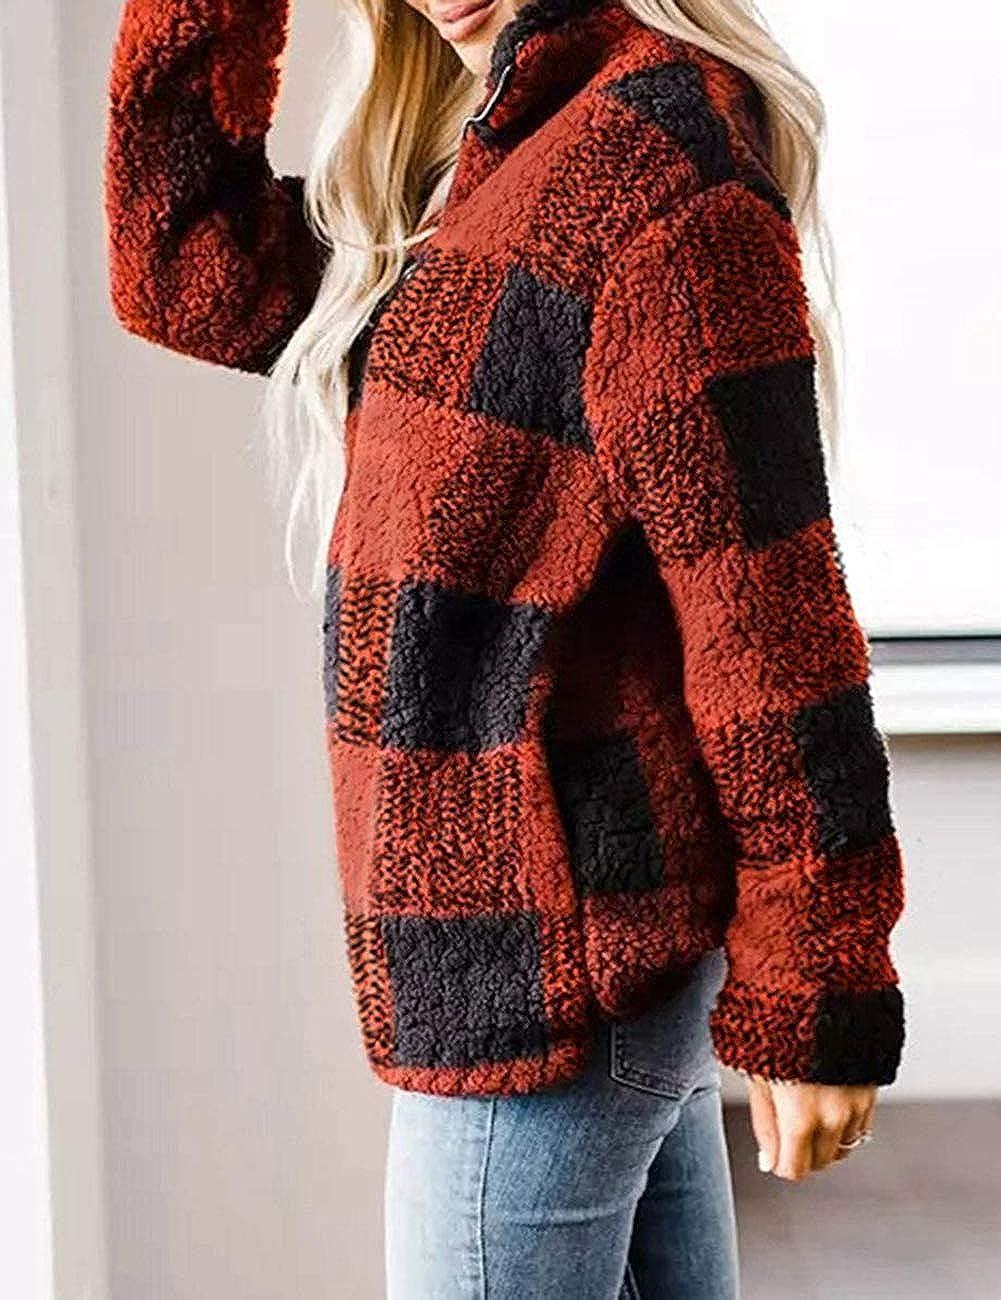 MEROKEETY Womens Plaid Sherpa Fleece Zip Sweatshirt Long Sleeve Pockets Pullover Jacket